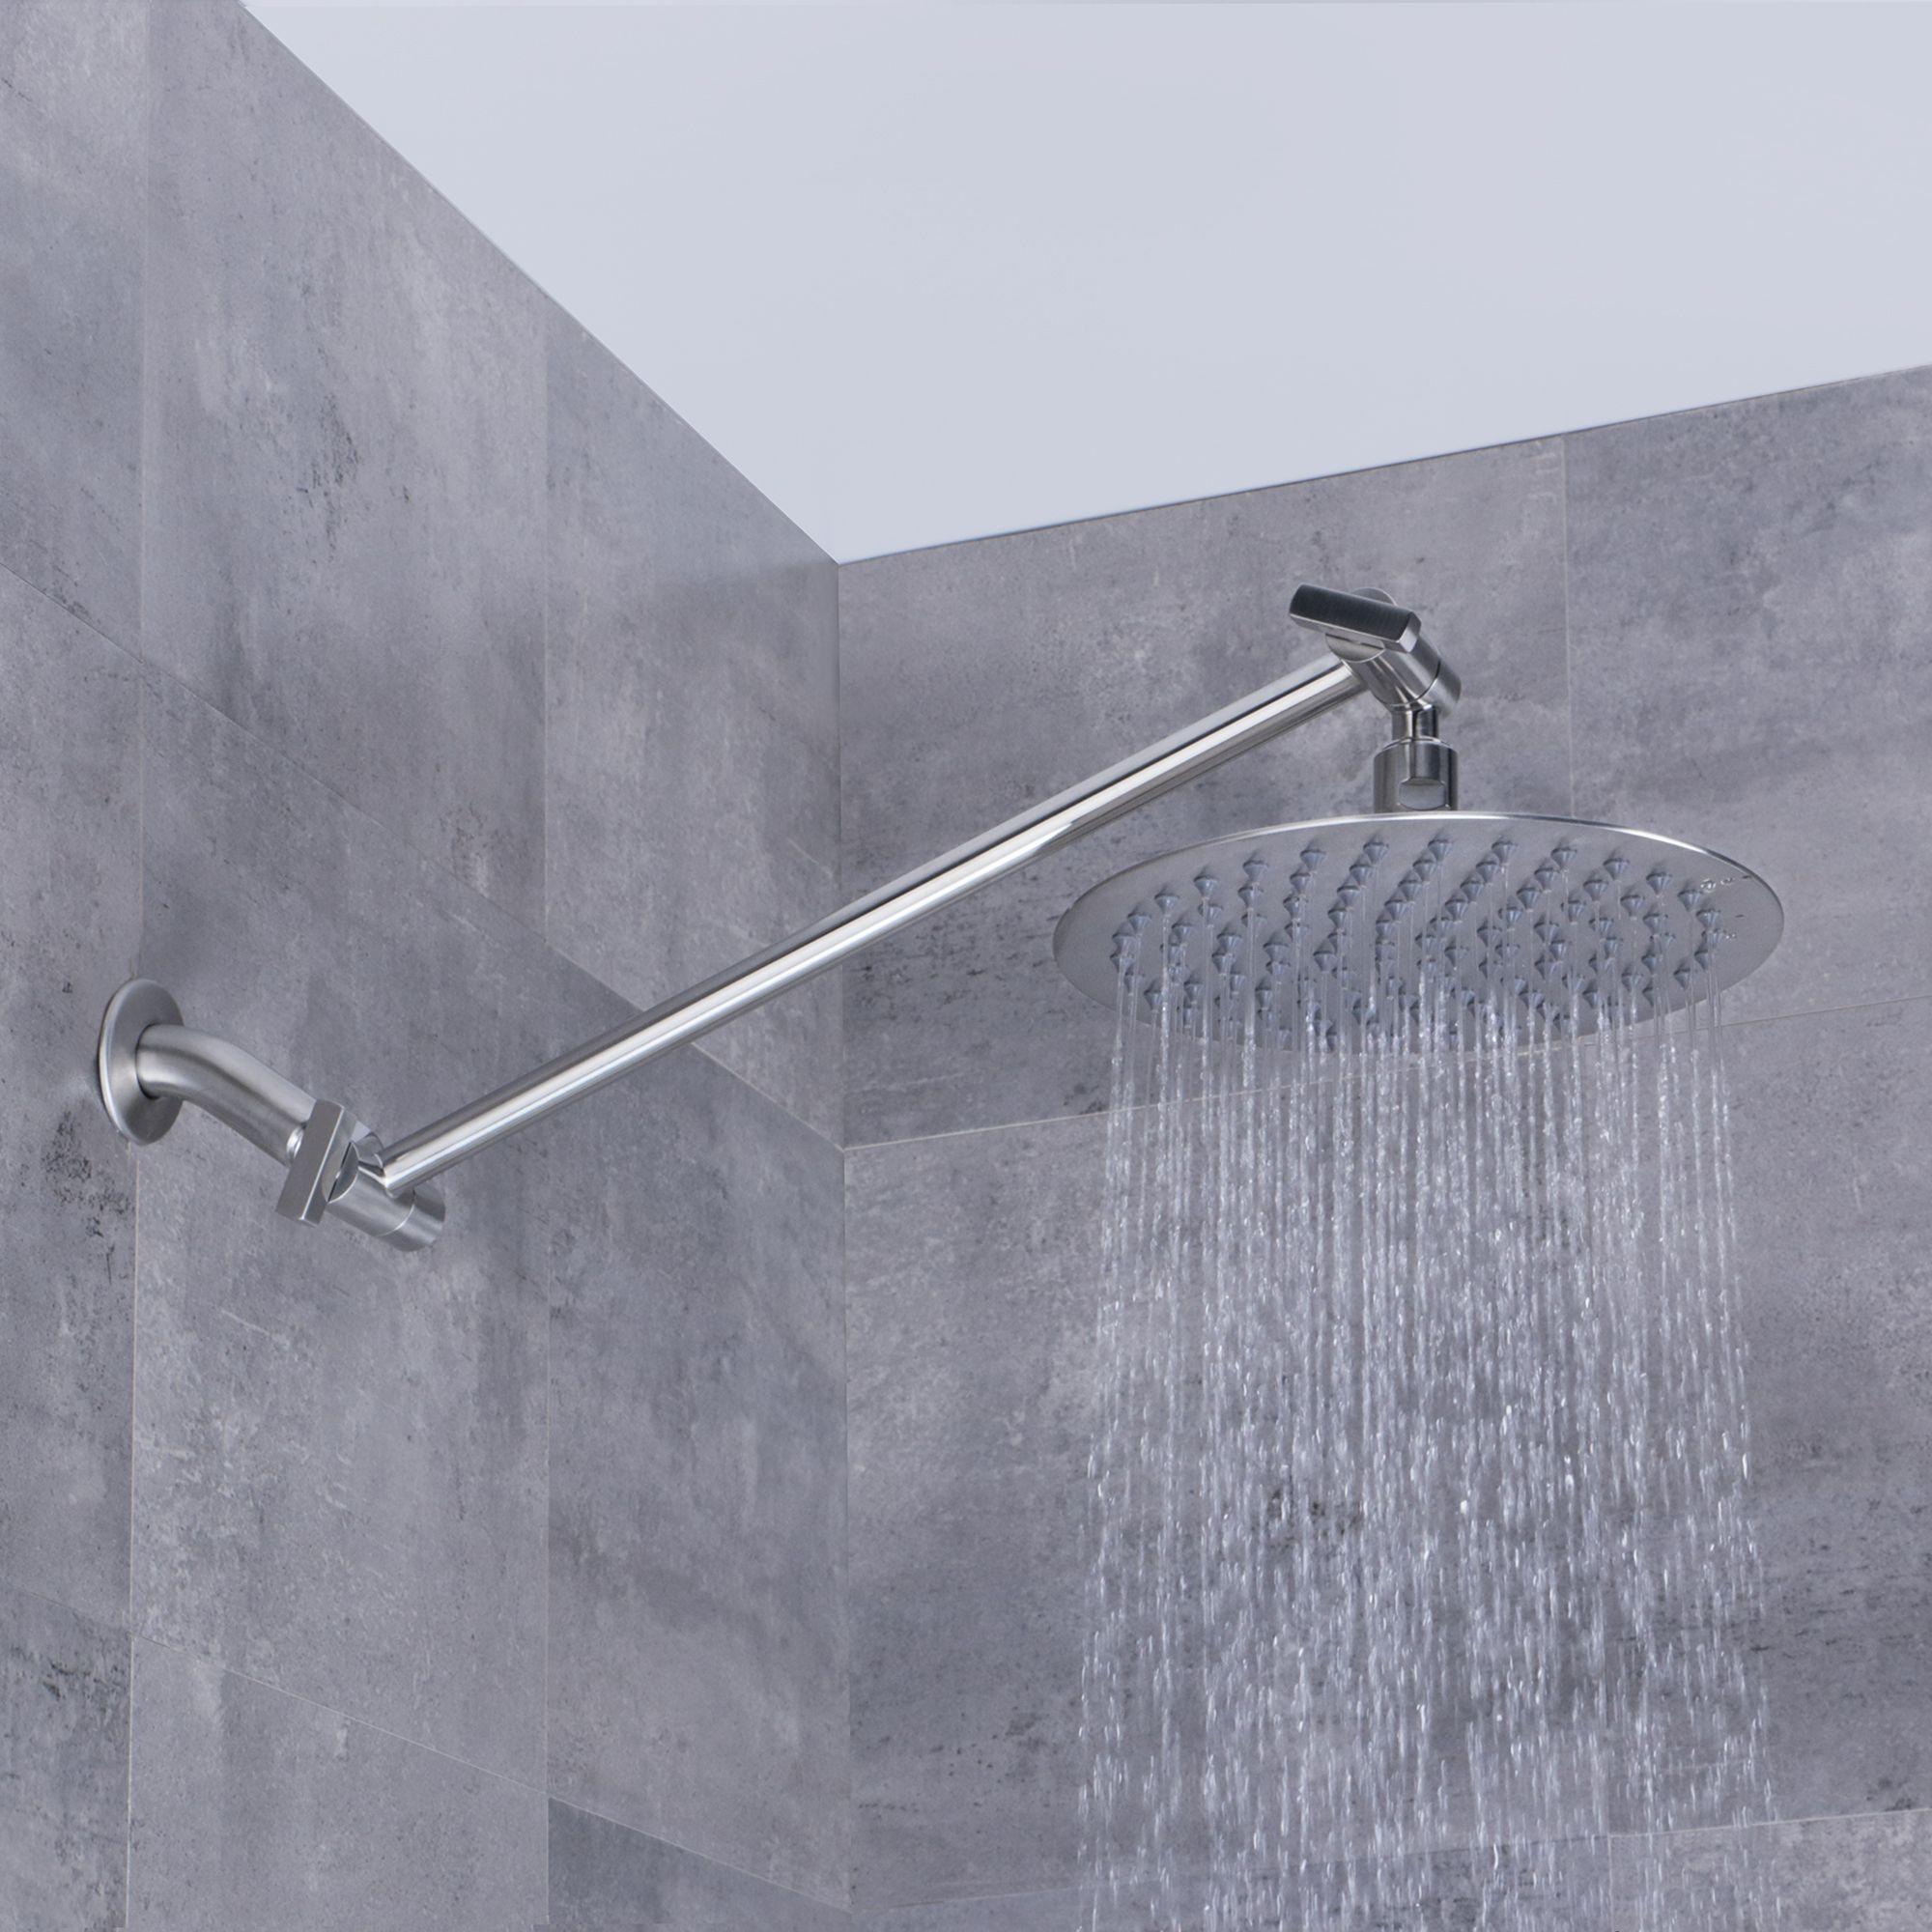 Rain Flow Shower Head.Afa Stainless 8